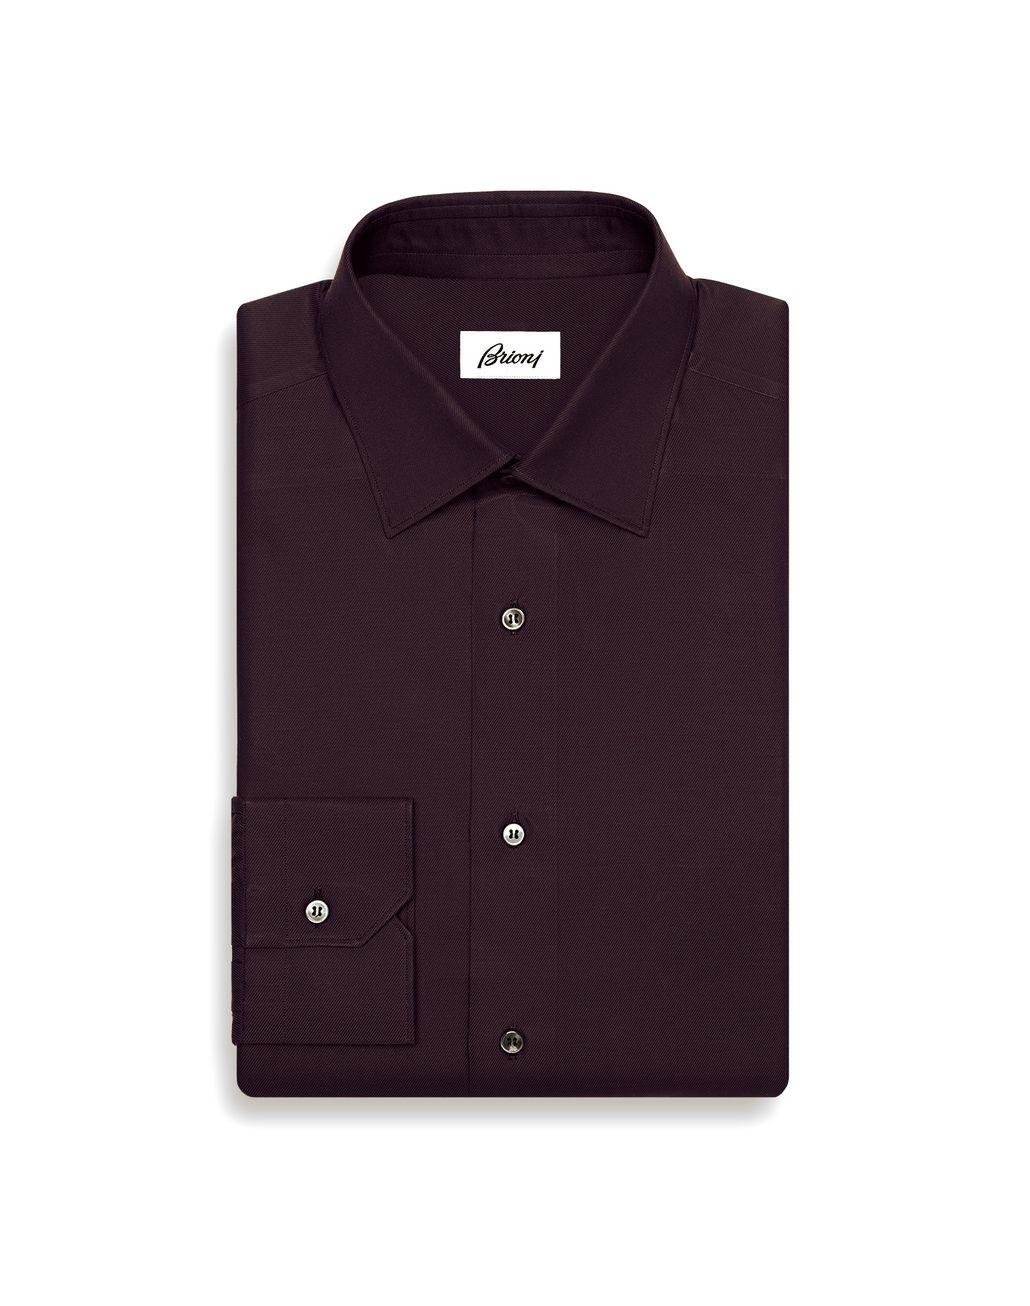 BRIONI 酒红色修身衬衫 正装衬衫 男士 f